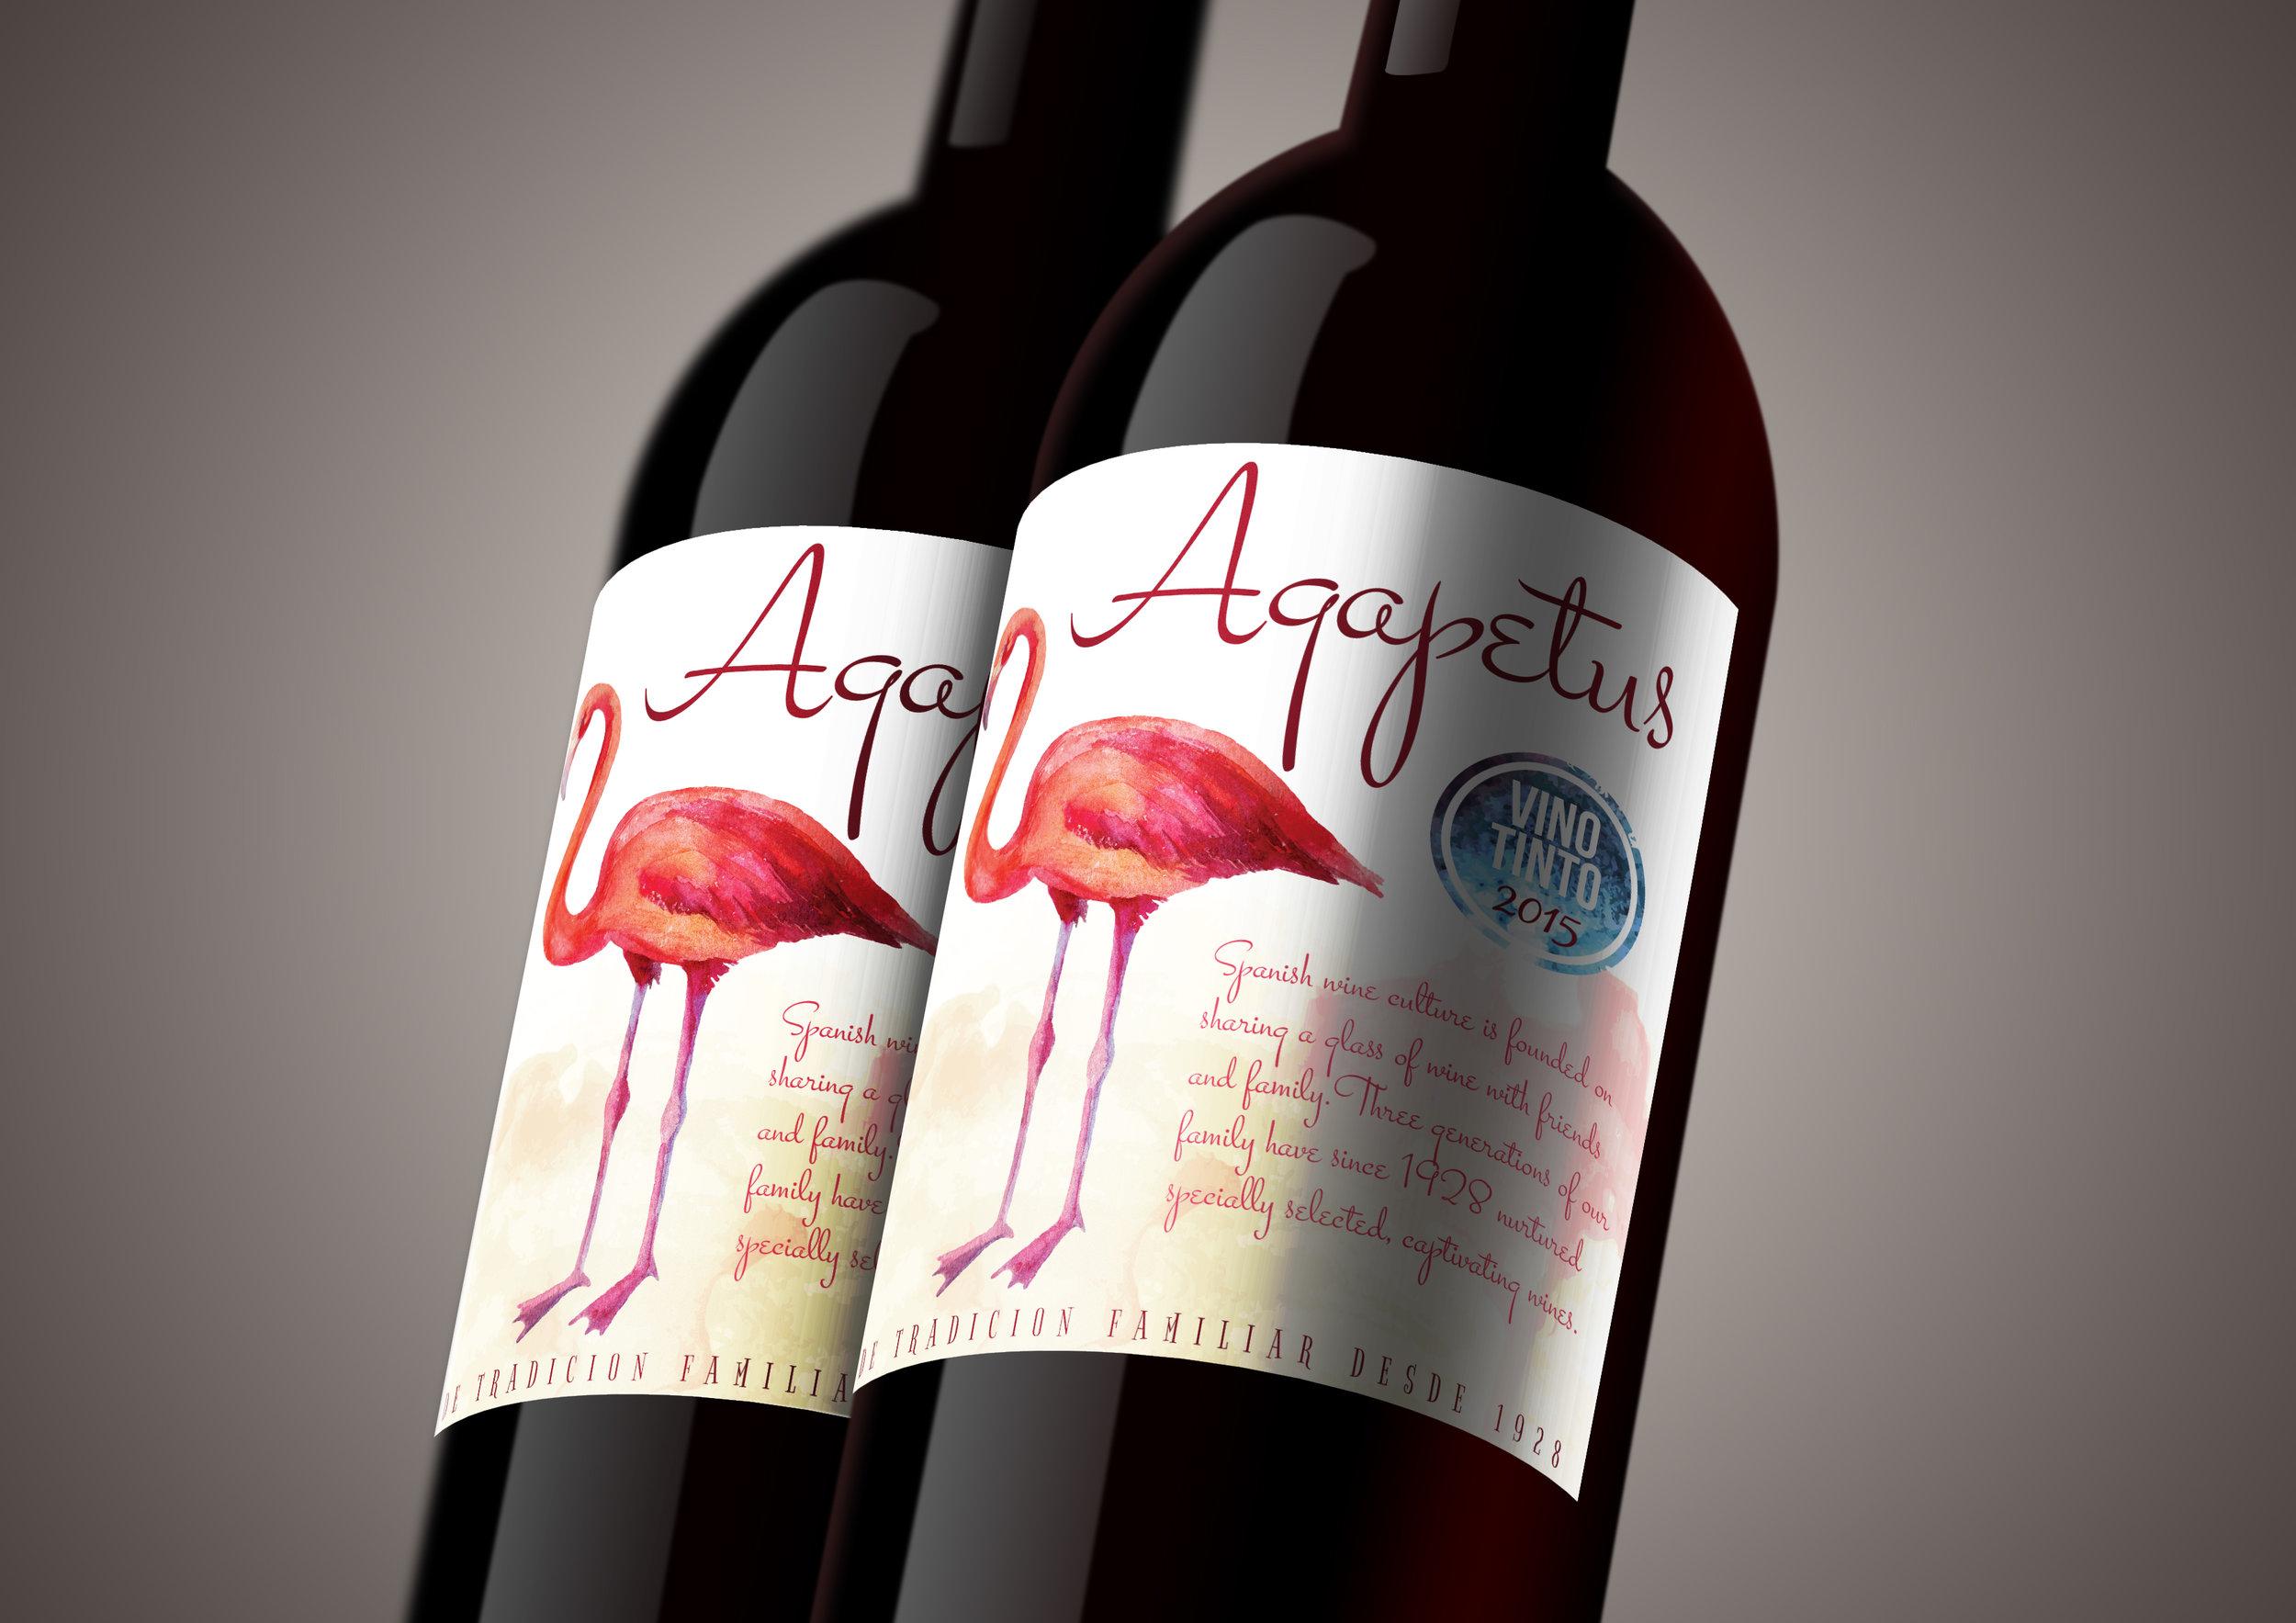 Agapetus 2 bottle shot.jpg